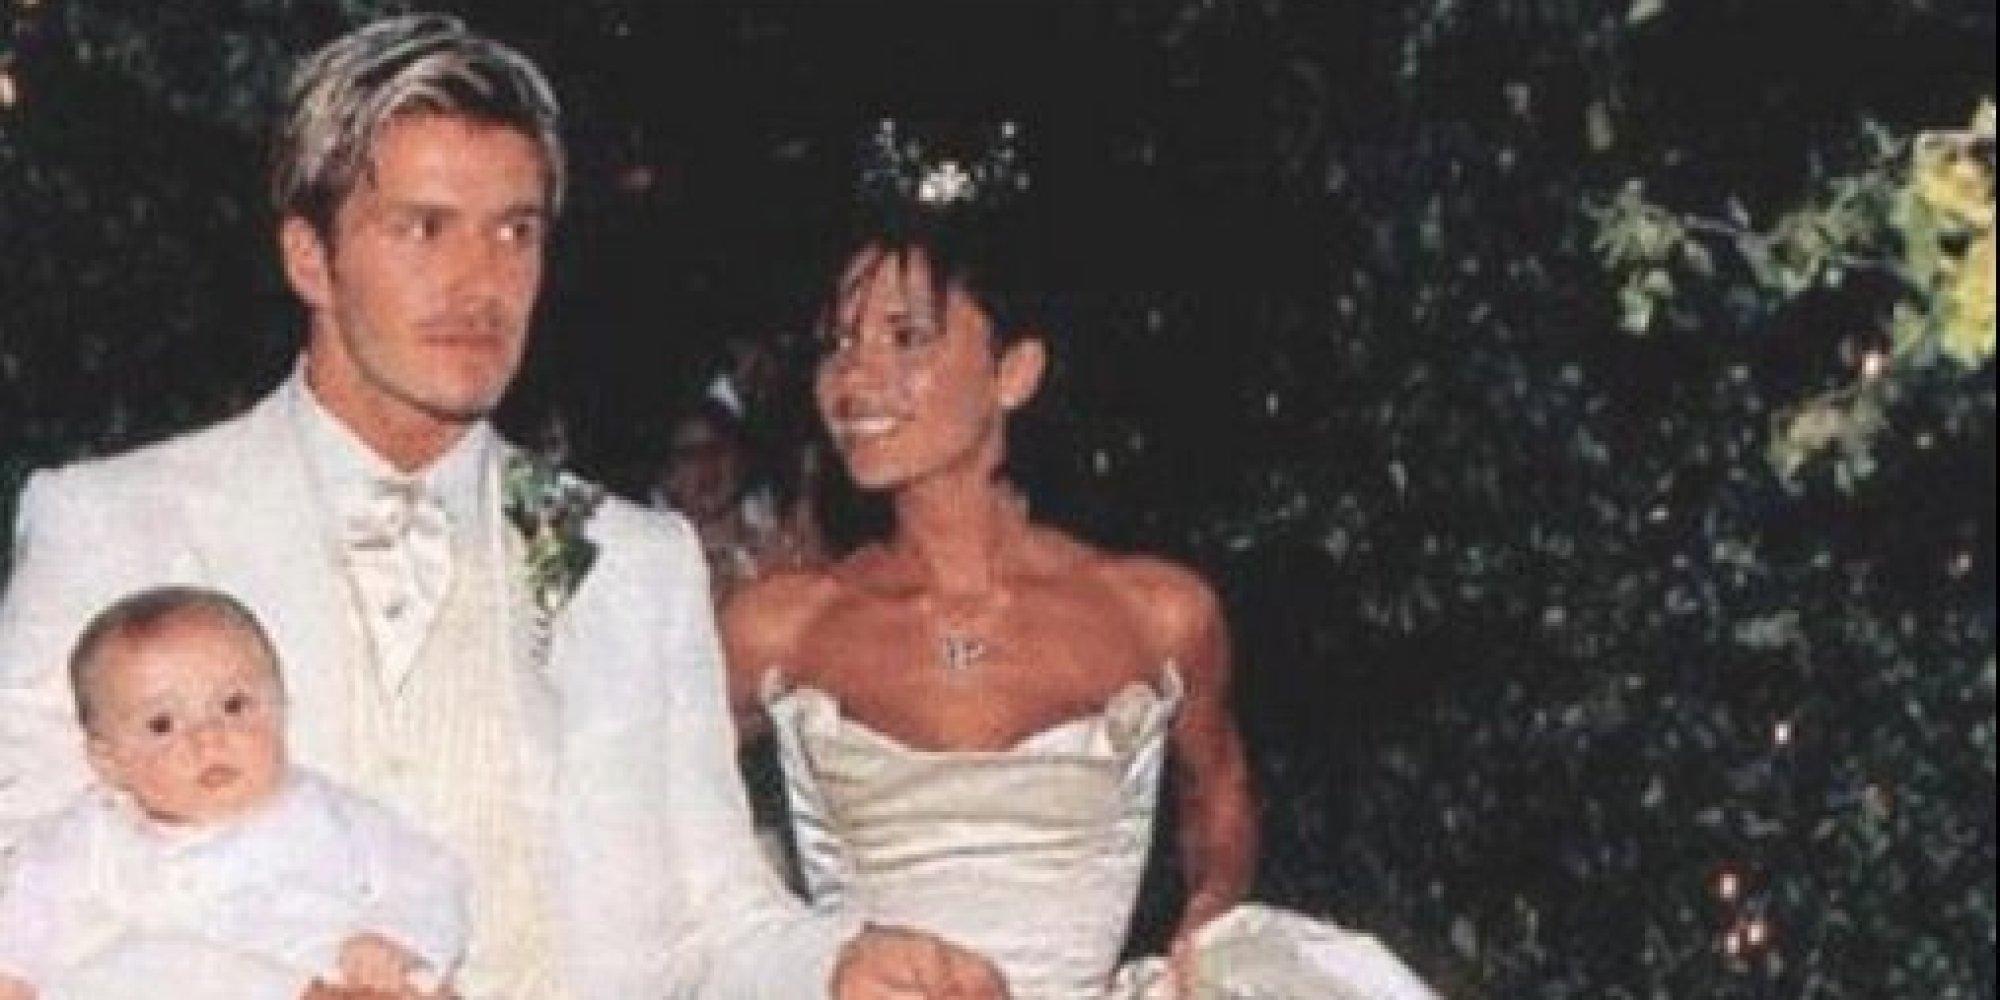 Victoria & David Beckham Celebrate Wedding Anniversary